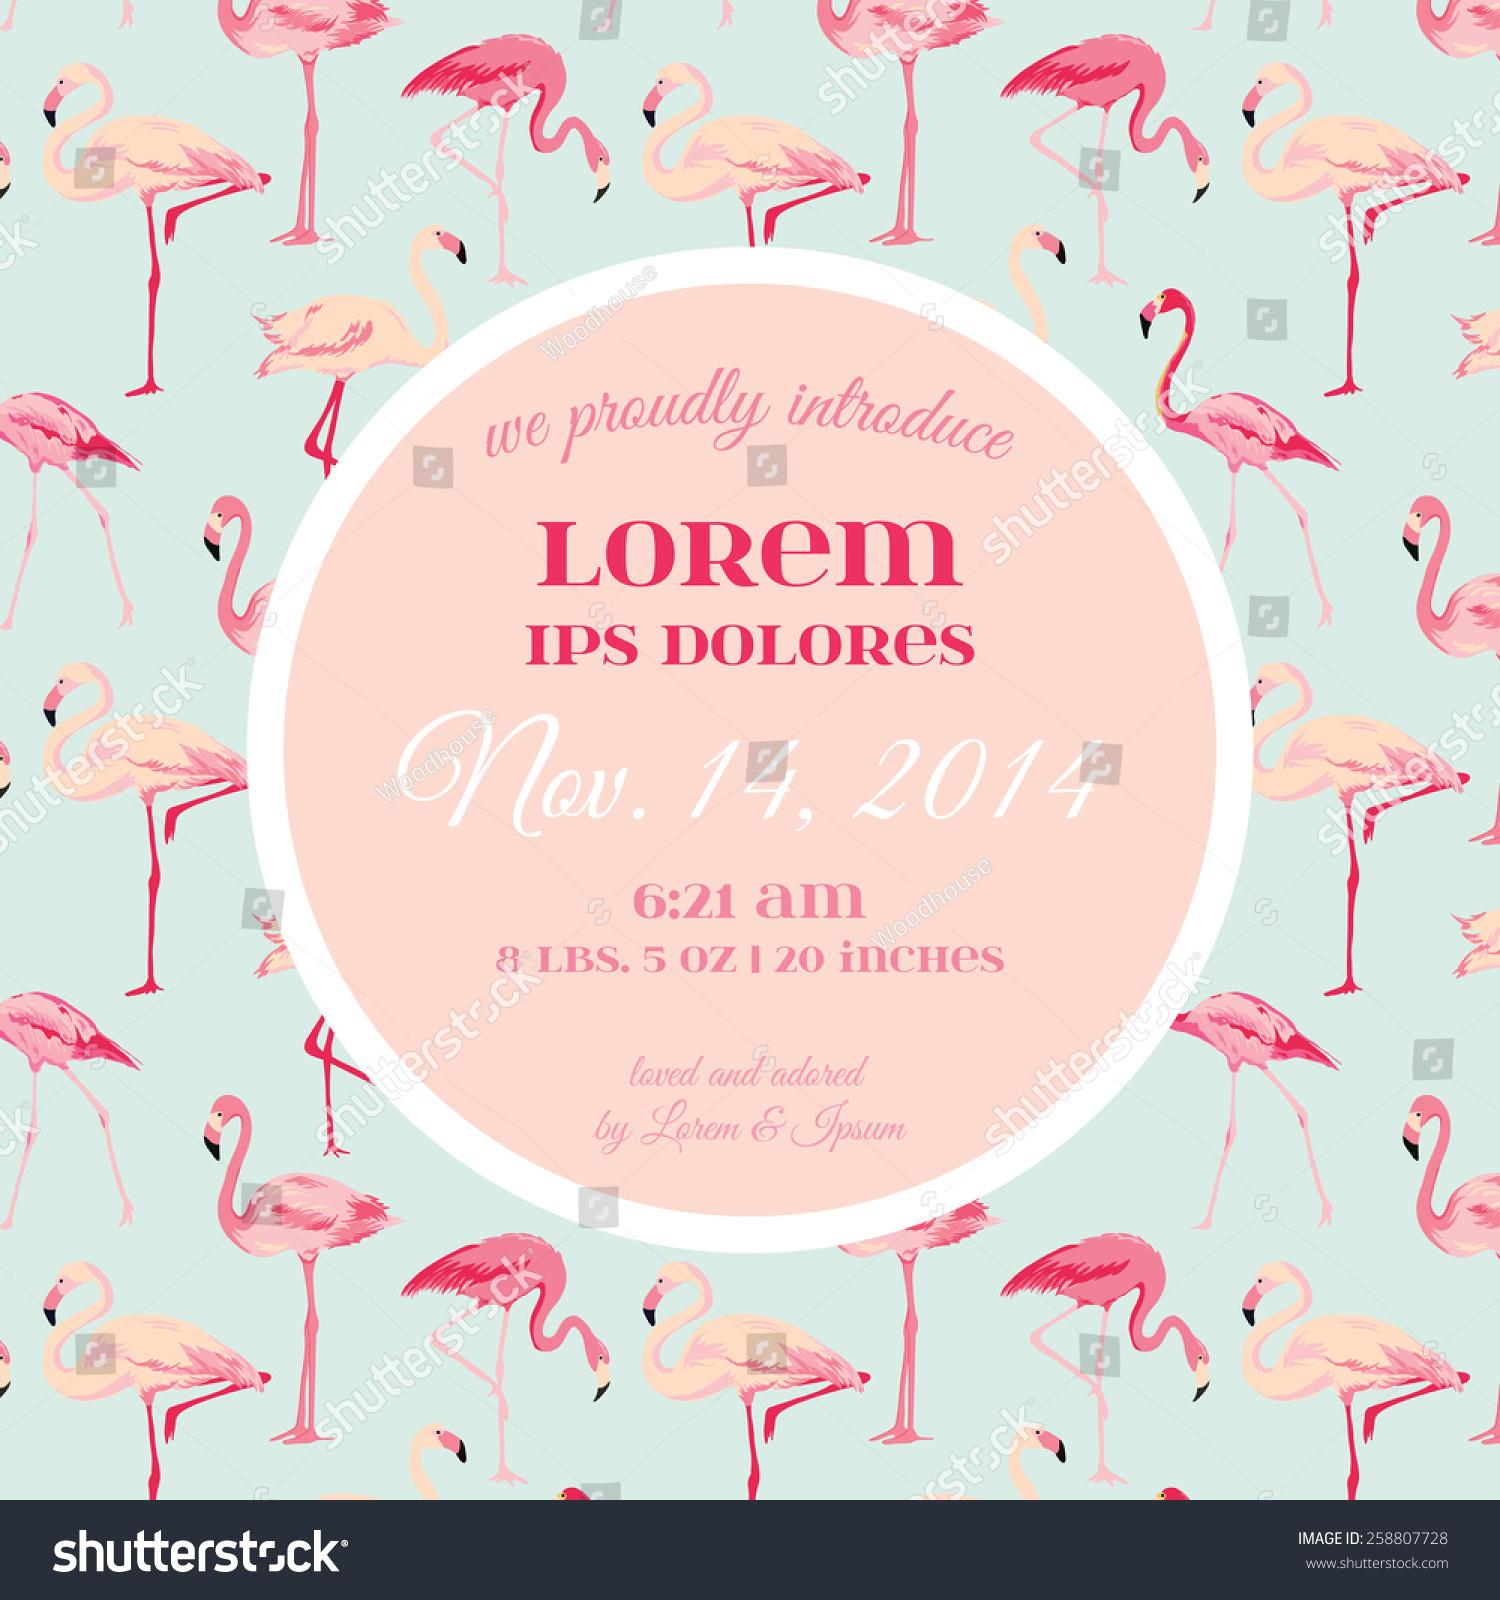 Flamingo Baby Shower Card – frenchkitten